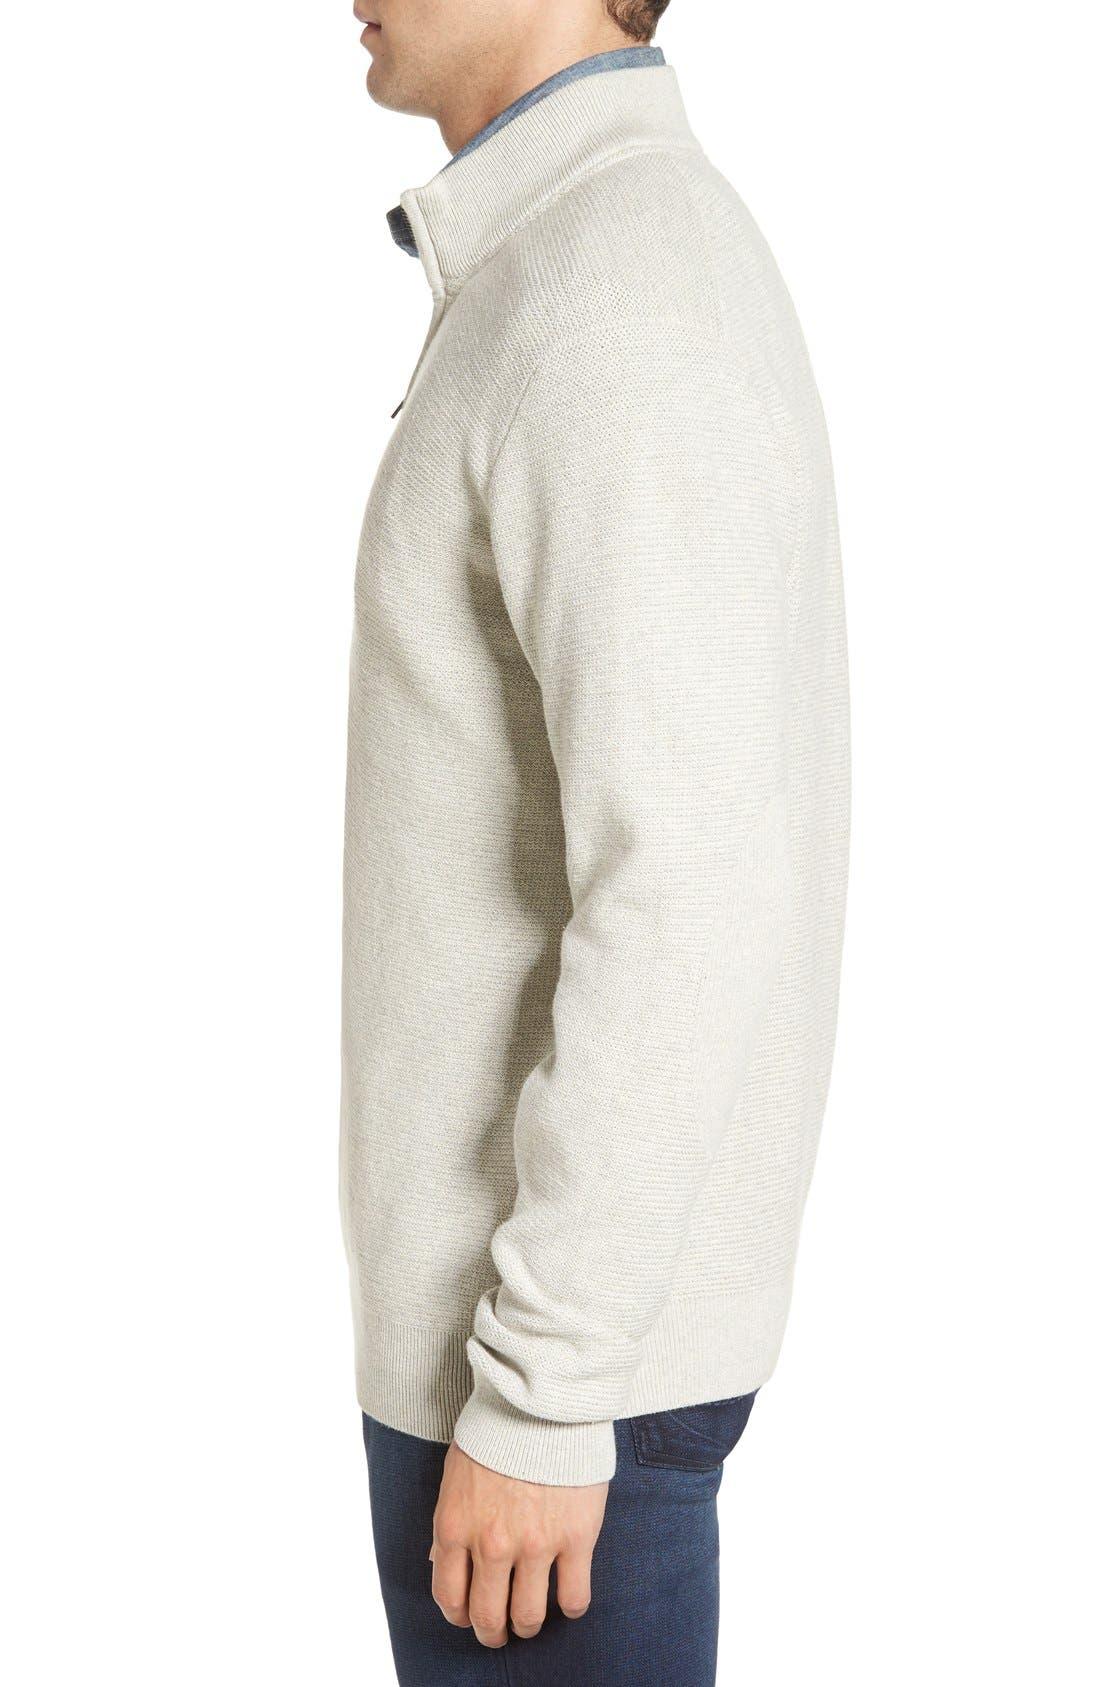 'Benson' Quarter Zip Textured Knit Sweater,                             Alternate thumbnail 3, color,                             Limestone Heather